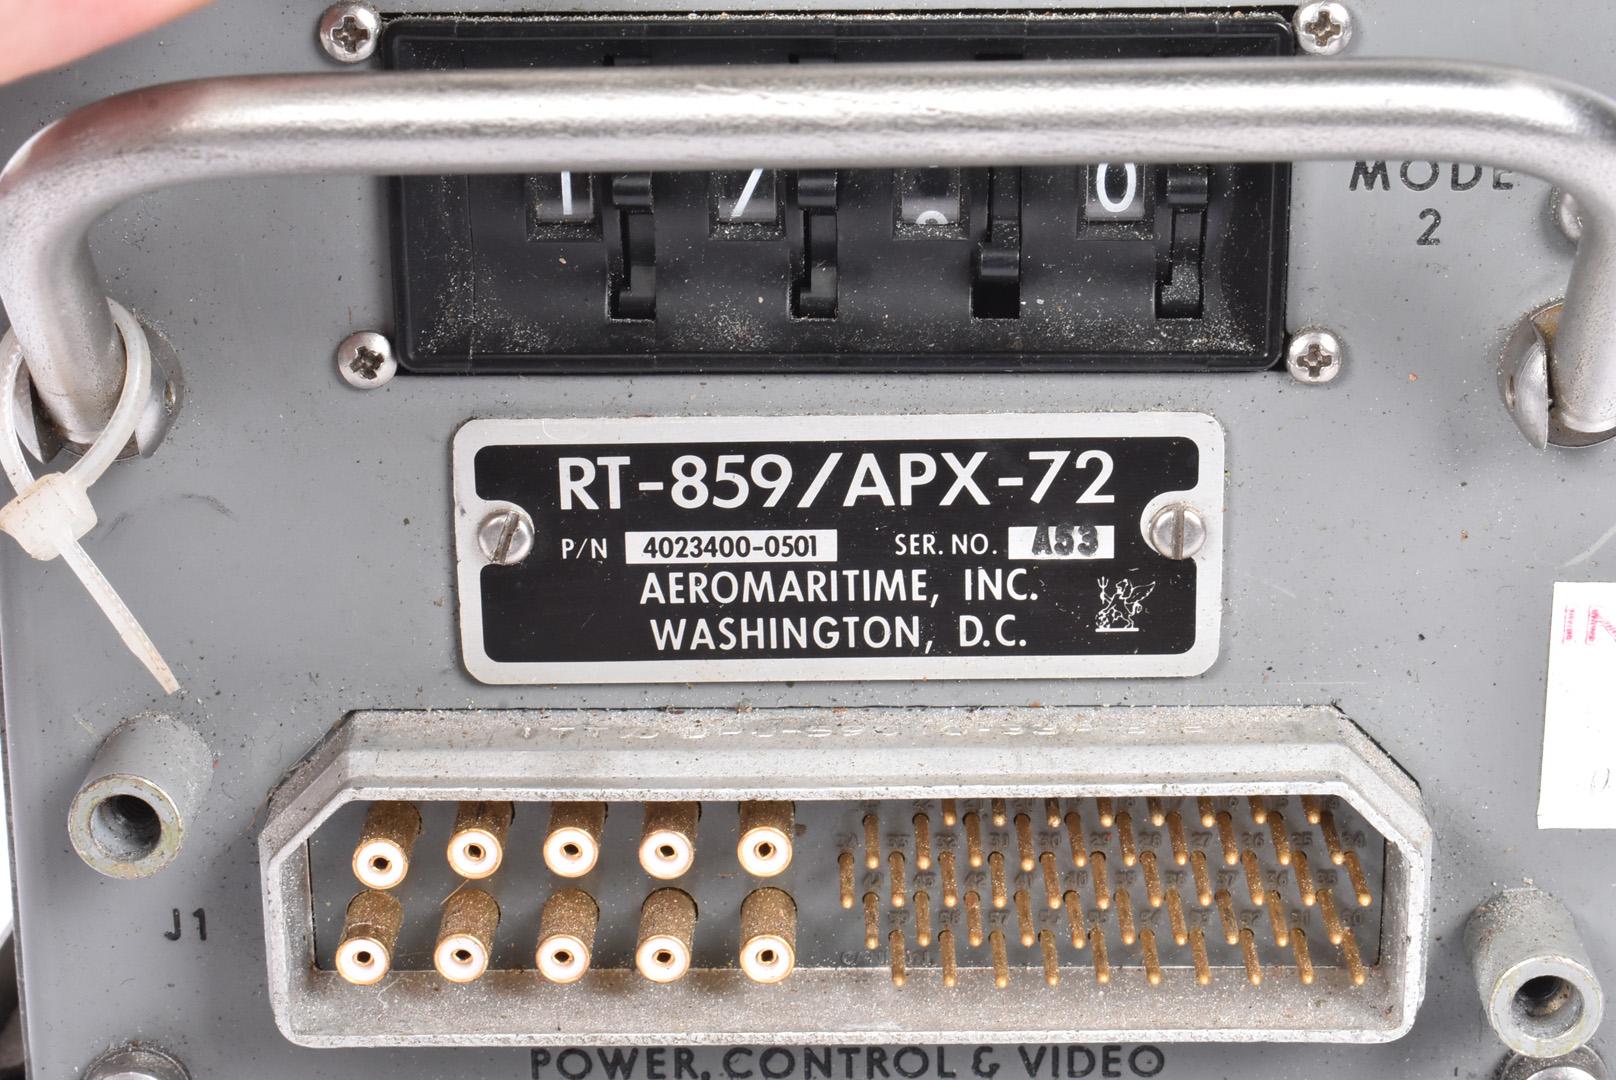 An Aeromaritime Inc of Washington Transponder, marked RT-859/APX-72, having stencilled - Image 2 of 5